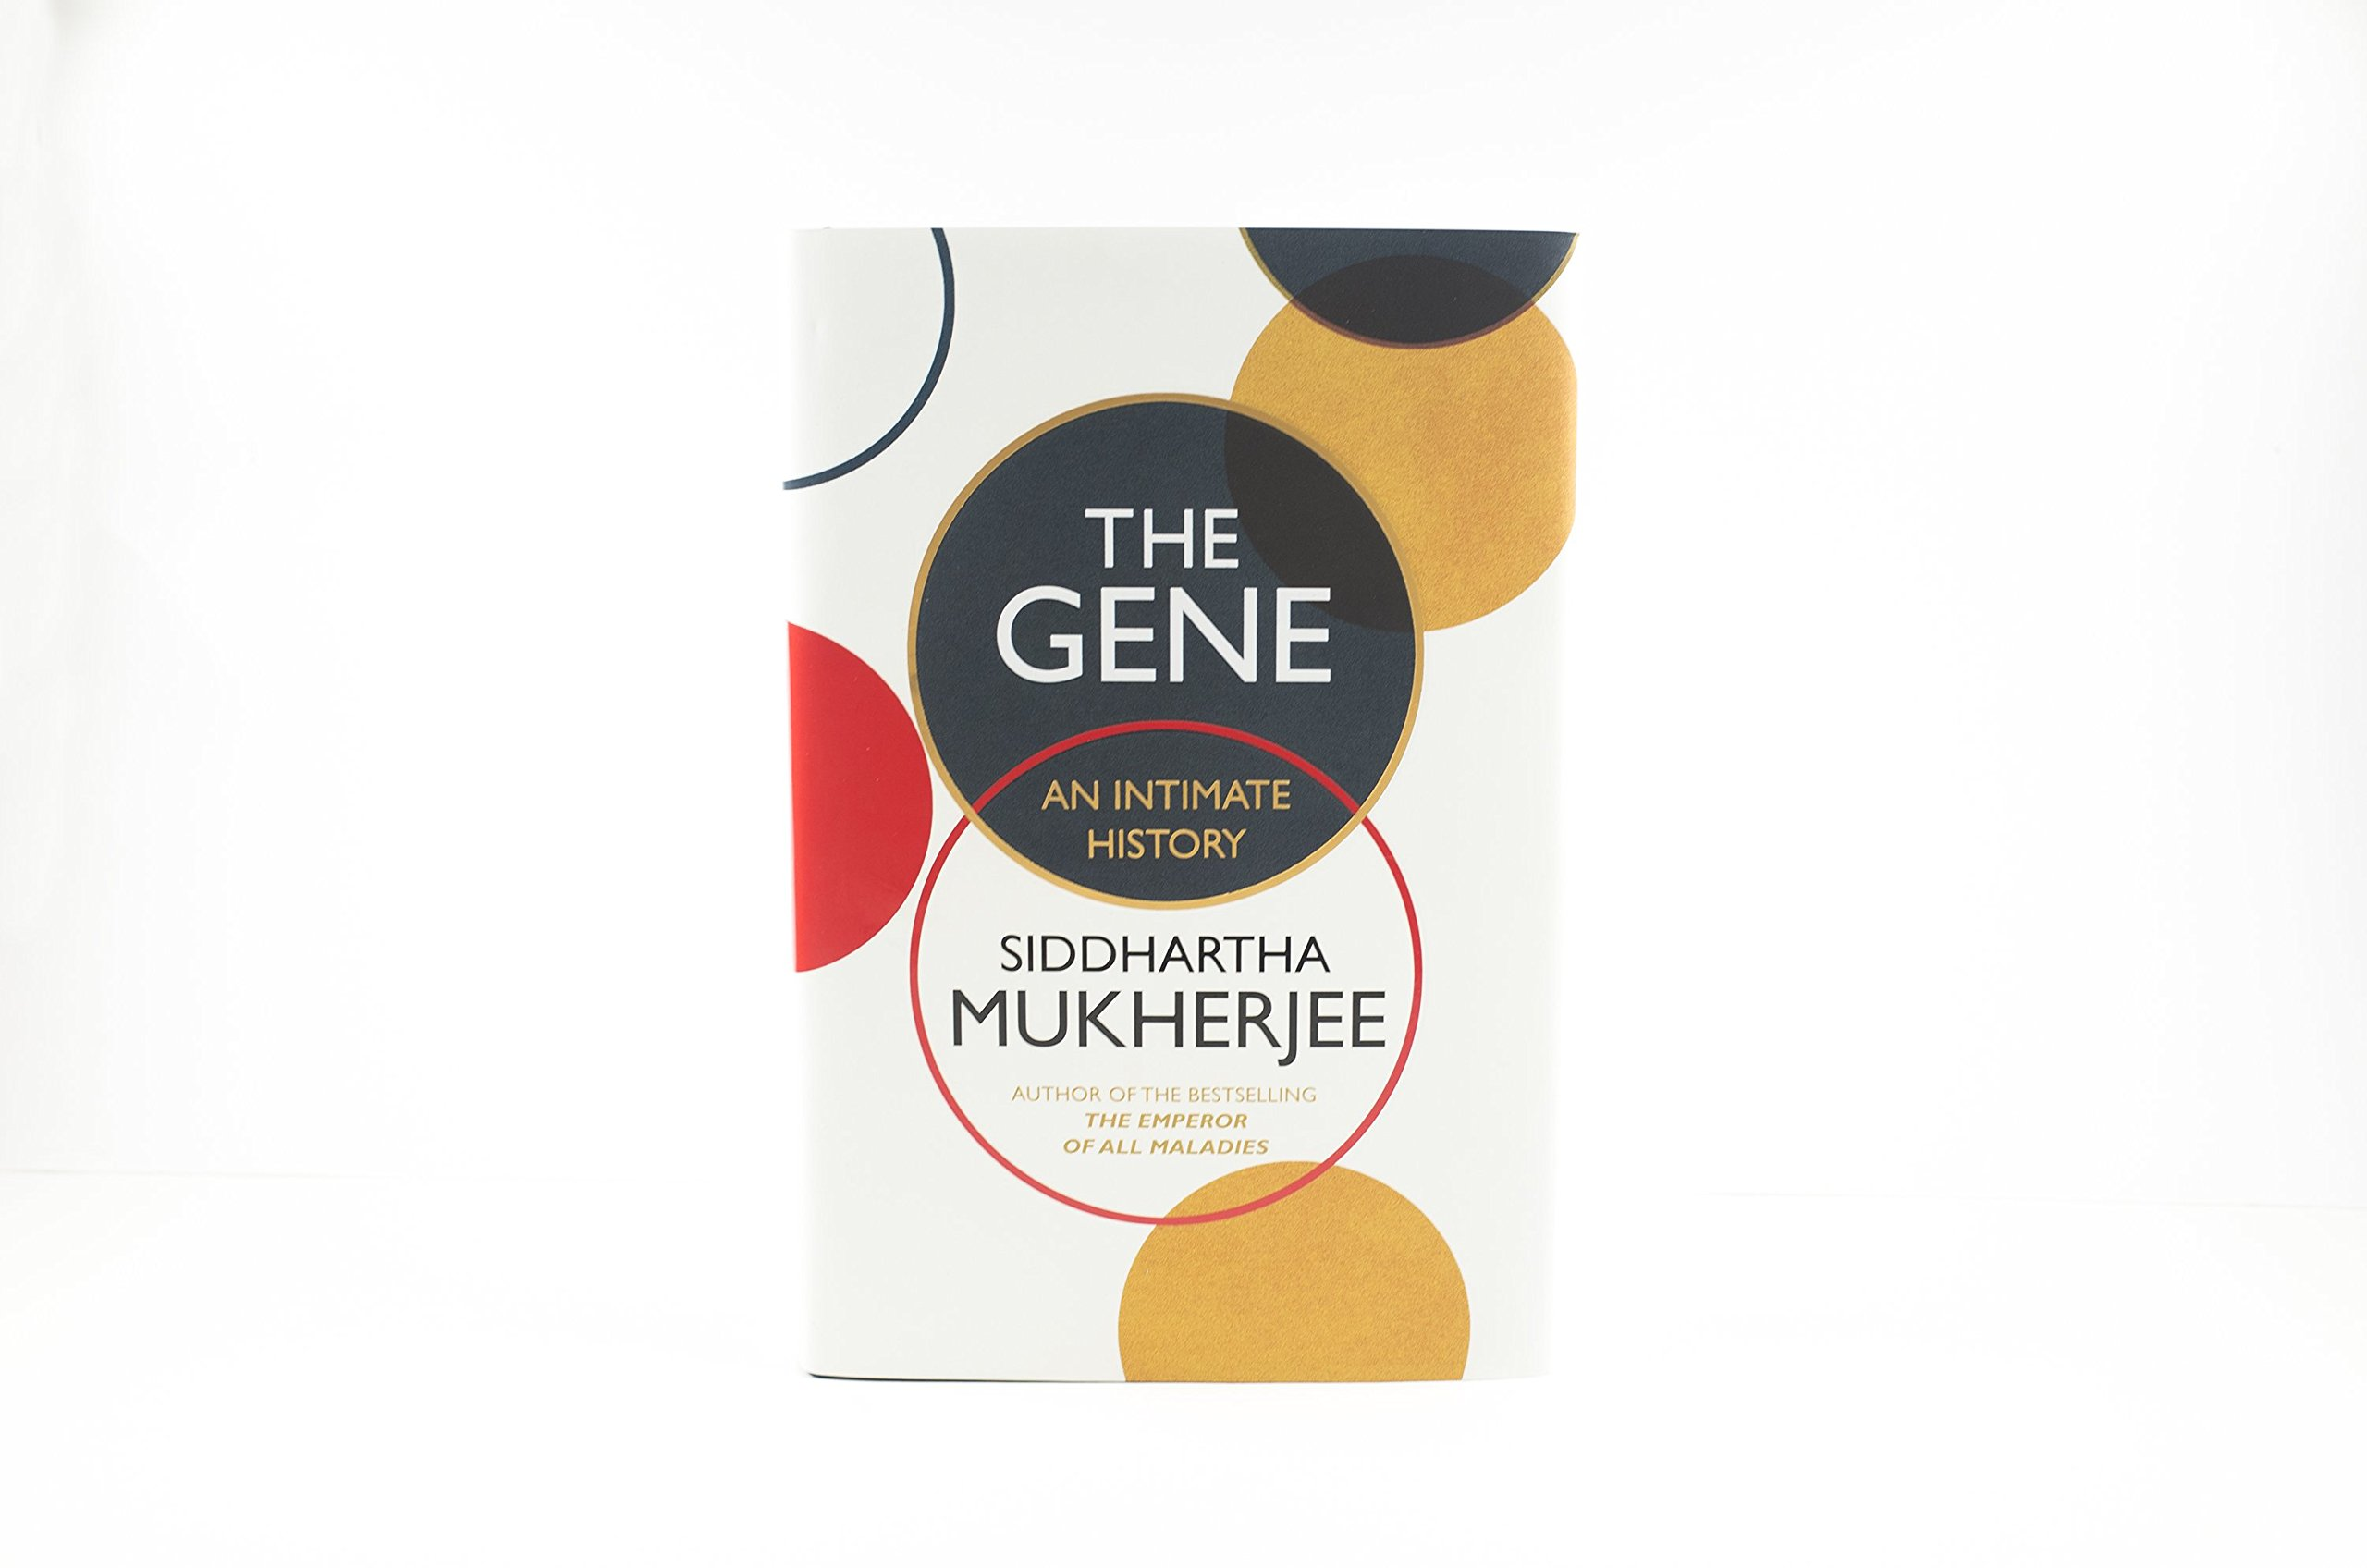 The Gene: An Intimate History: Amazon: Siddhartha Mukherjee:  9781847922632: Books